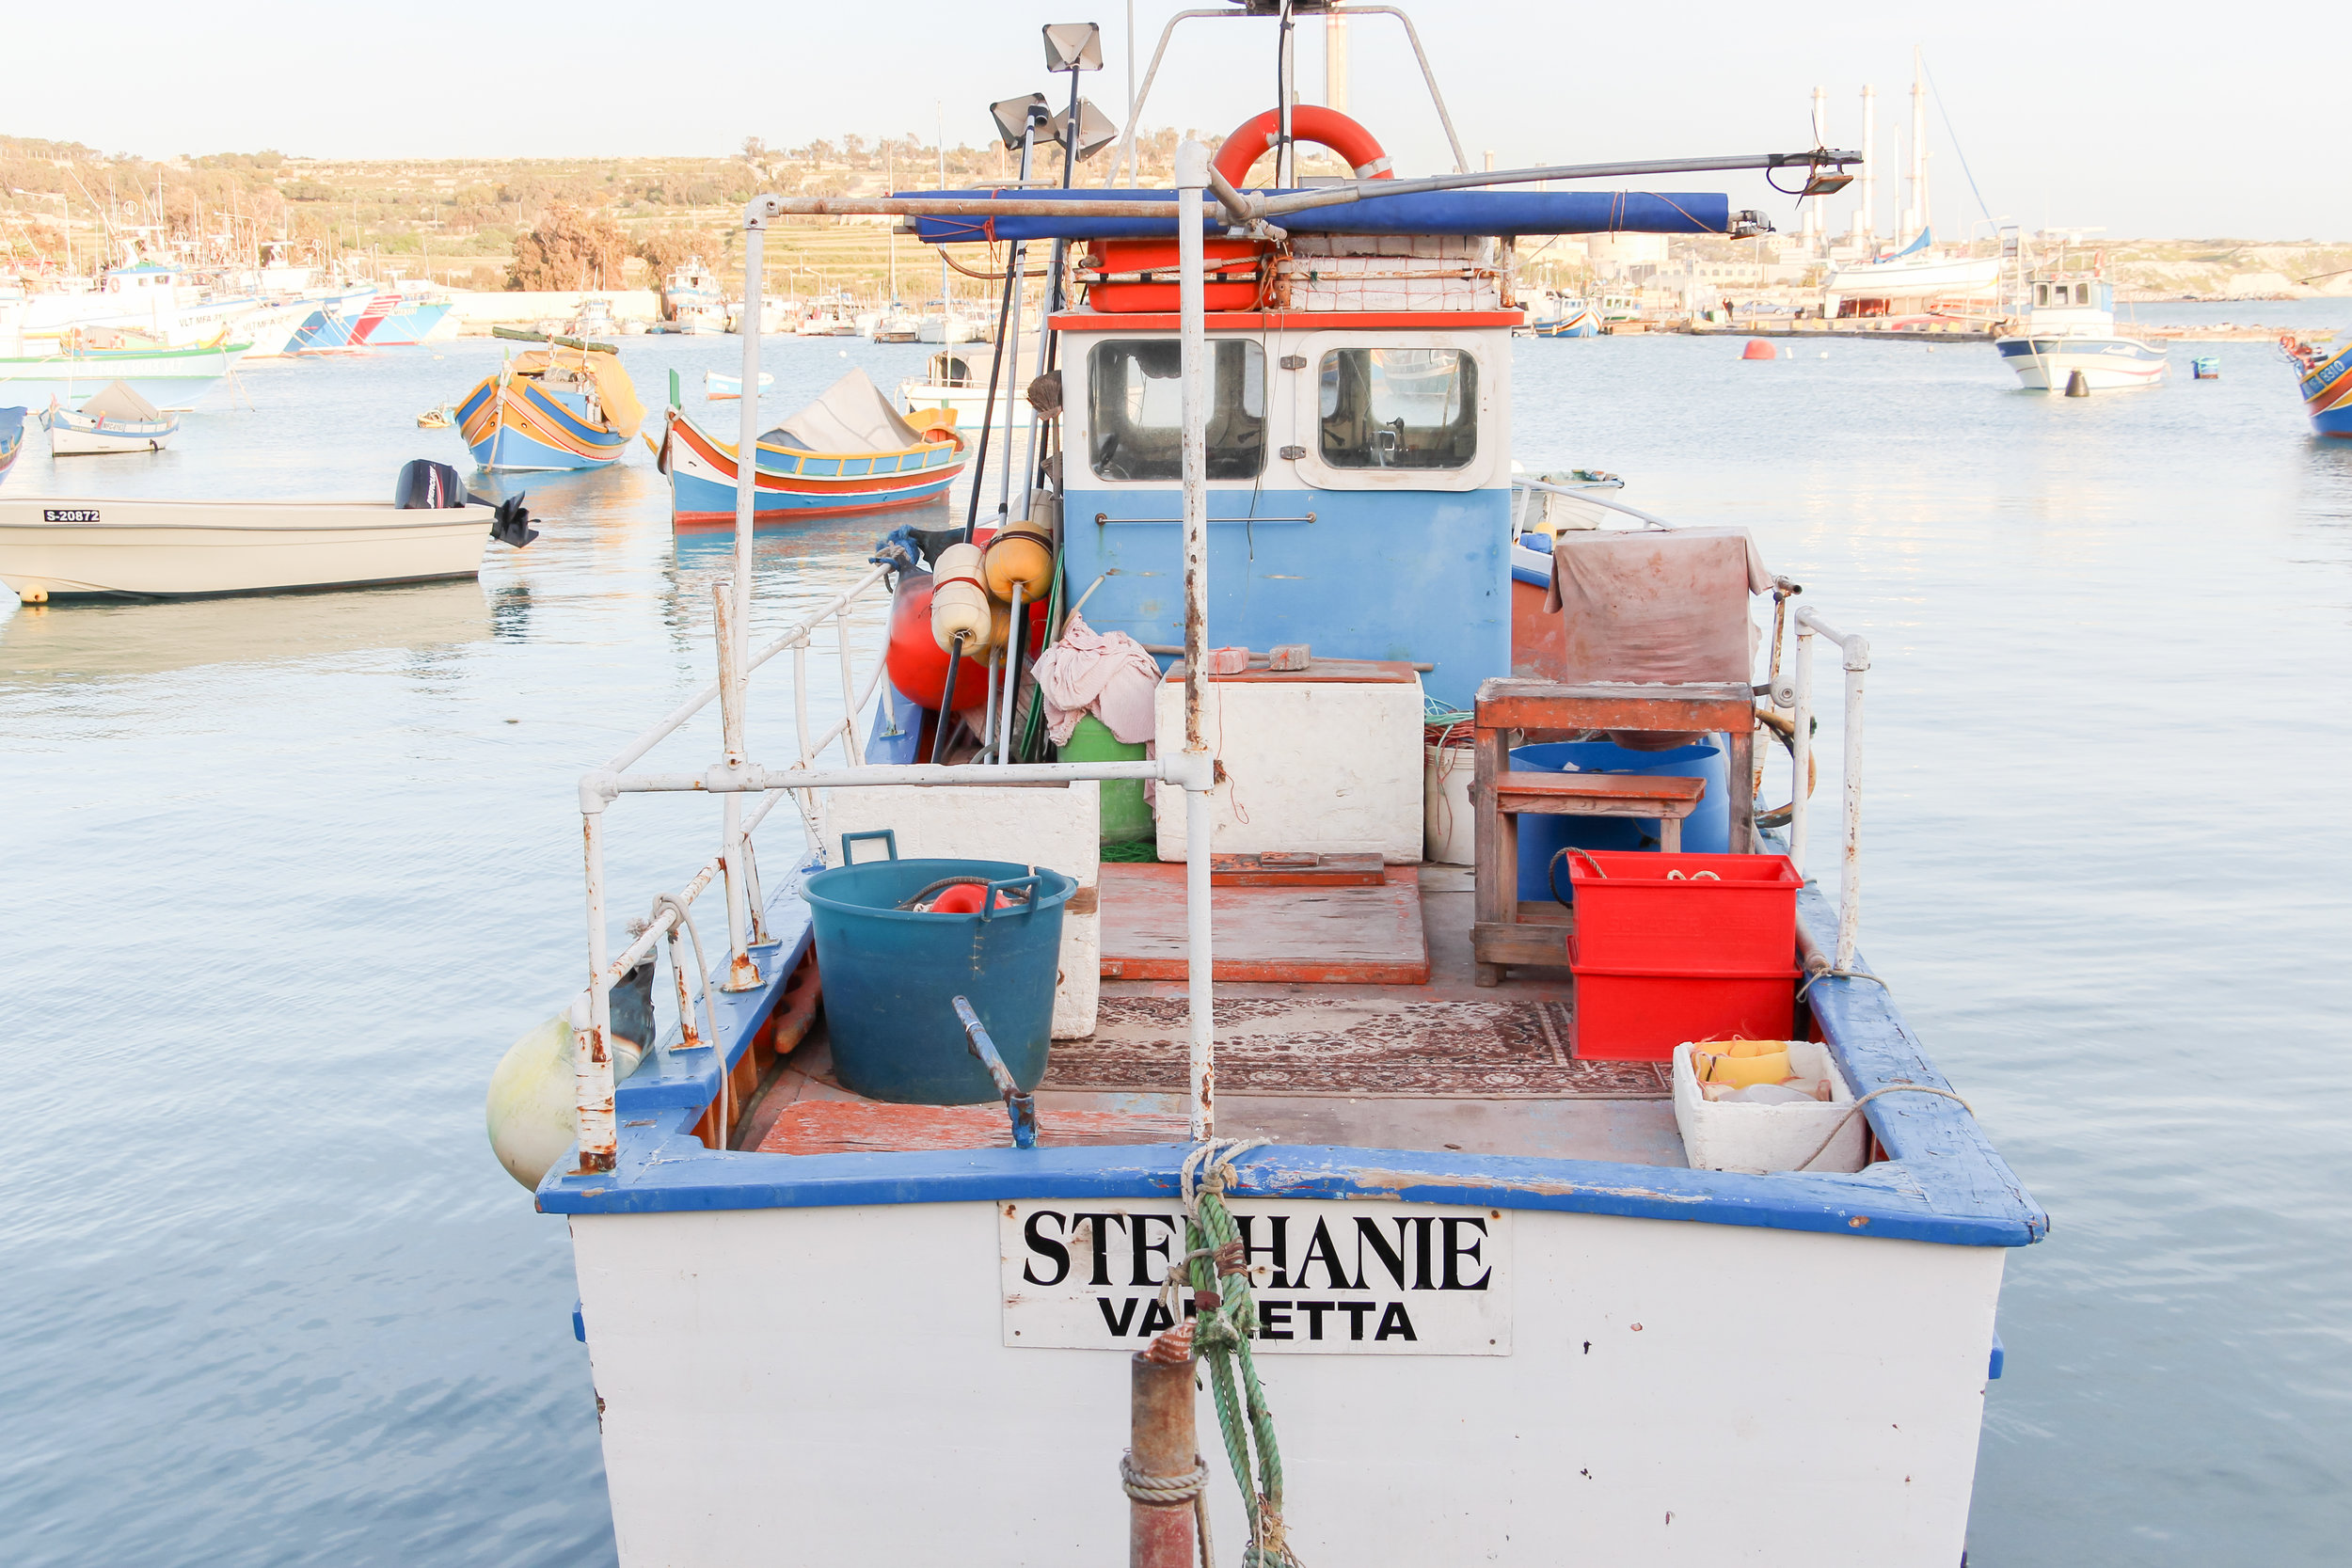 Maltese Boats | Traditional Fishing Village | Mediterranean Sea | Marsaxlokk - Thinking About Appreciation For Quality In Malta | Malta, Europe | DoLessGetMoreDone.com | - Canon Minimal Travel Documentary Photography - search for Liveability | Sustainability